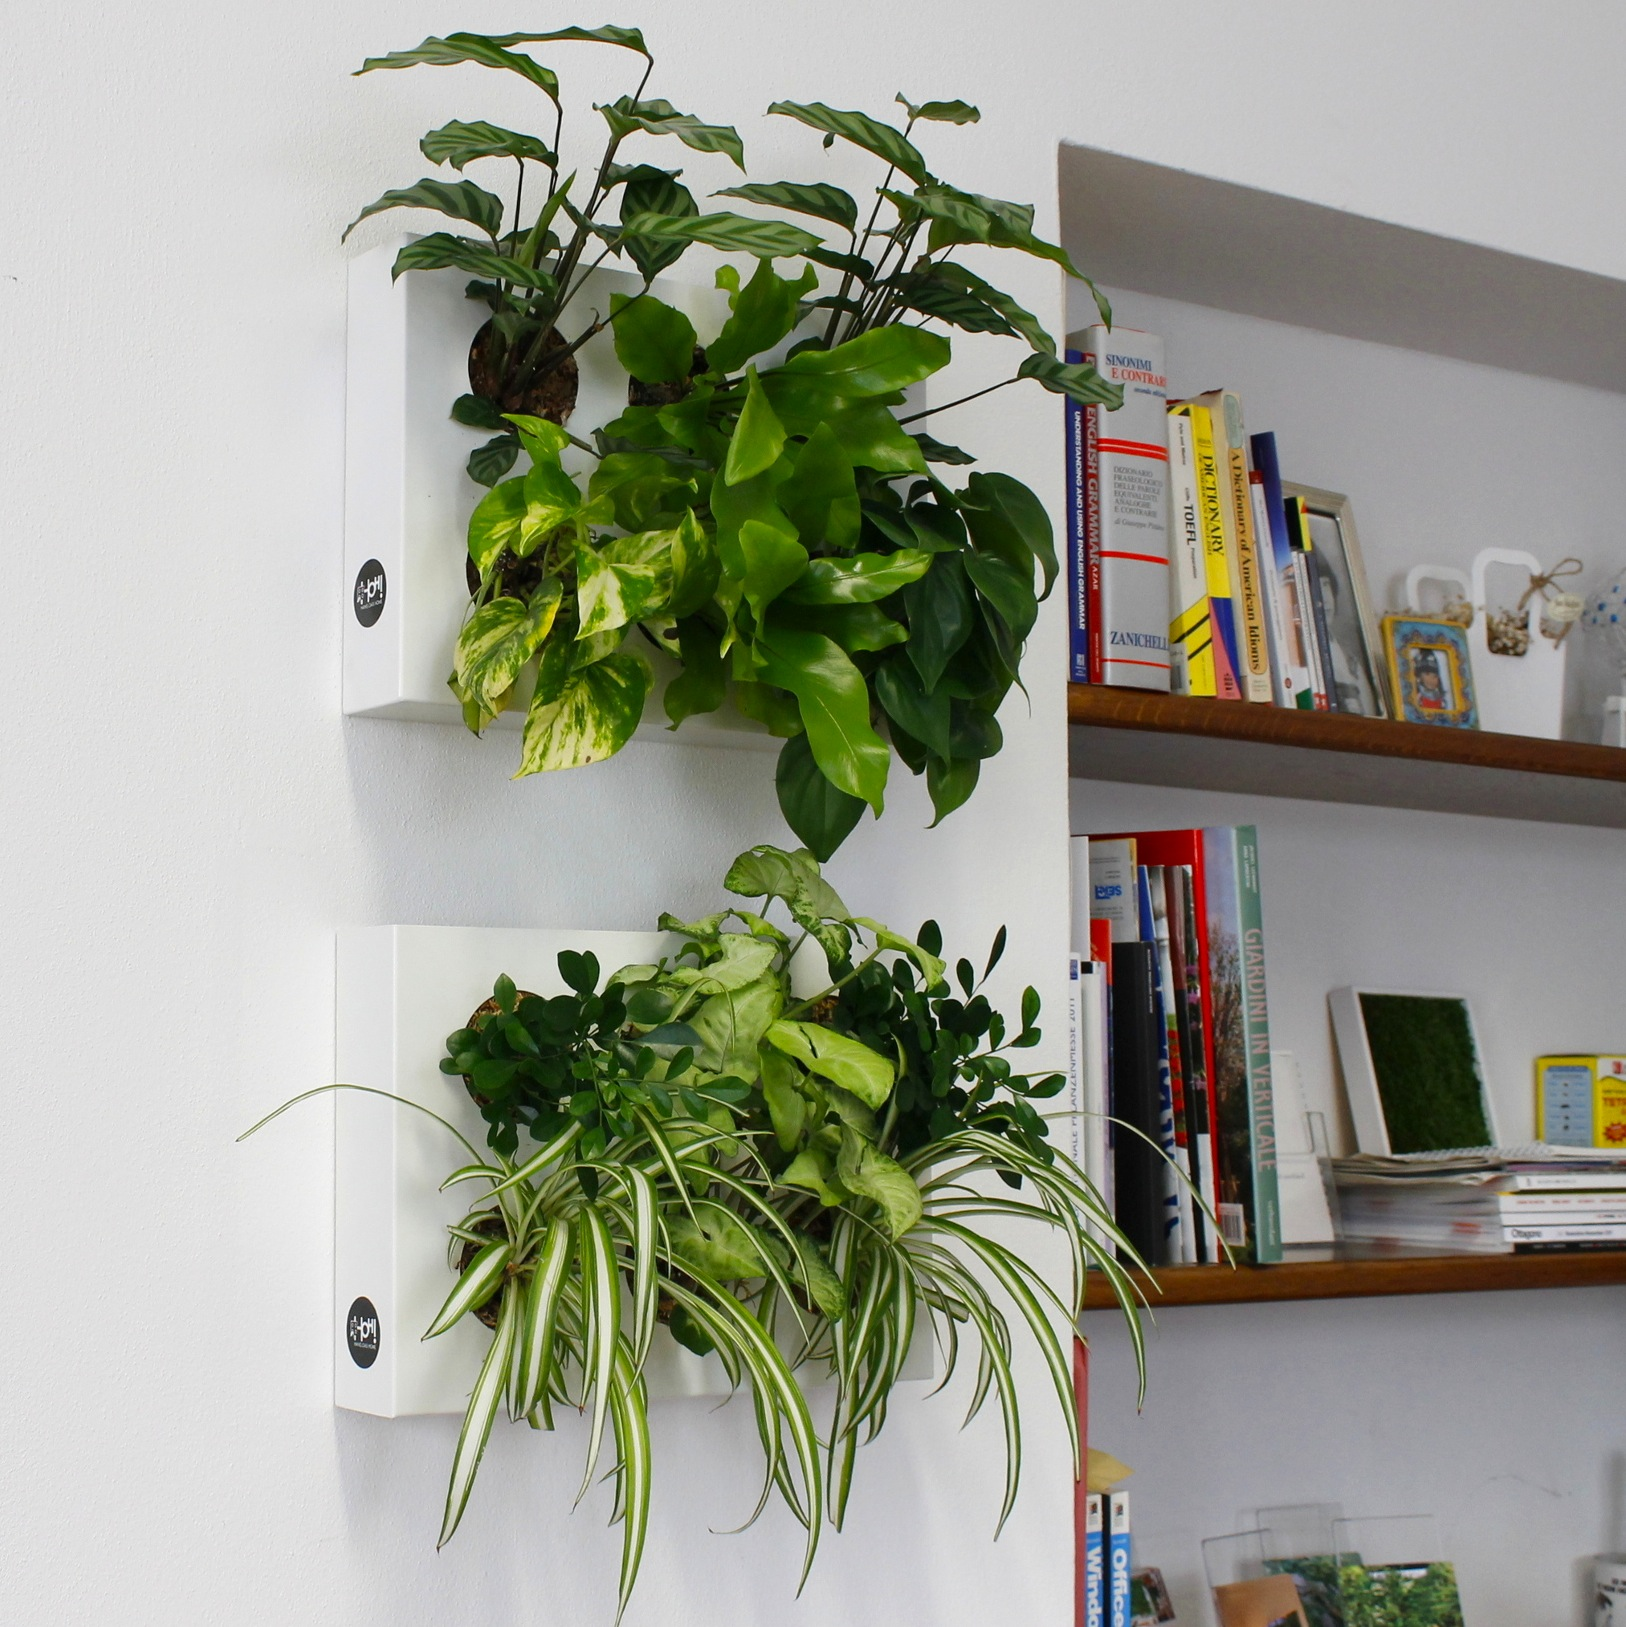 Quadri vegetali fai da te 16 idee per decorare casa - Pareti verdi per interni ...